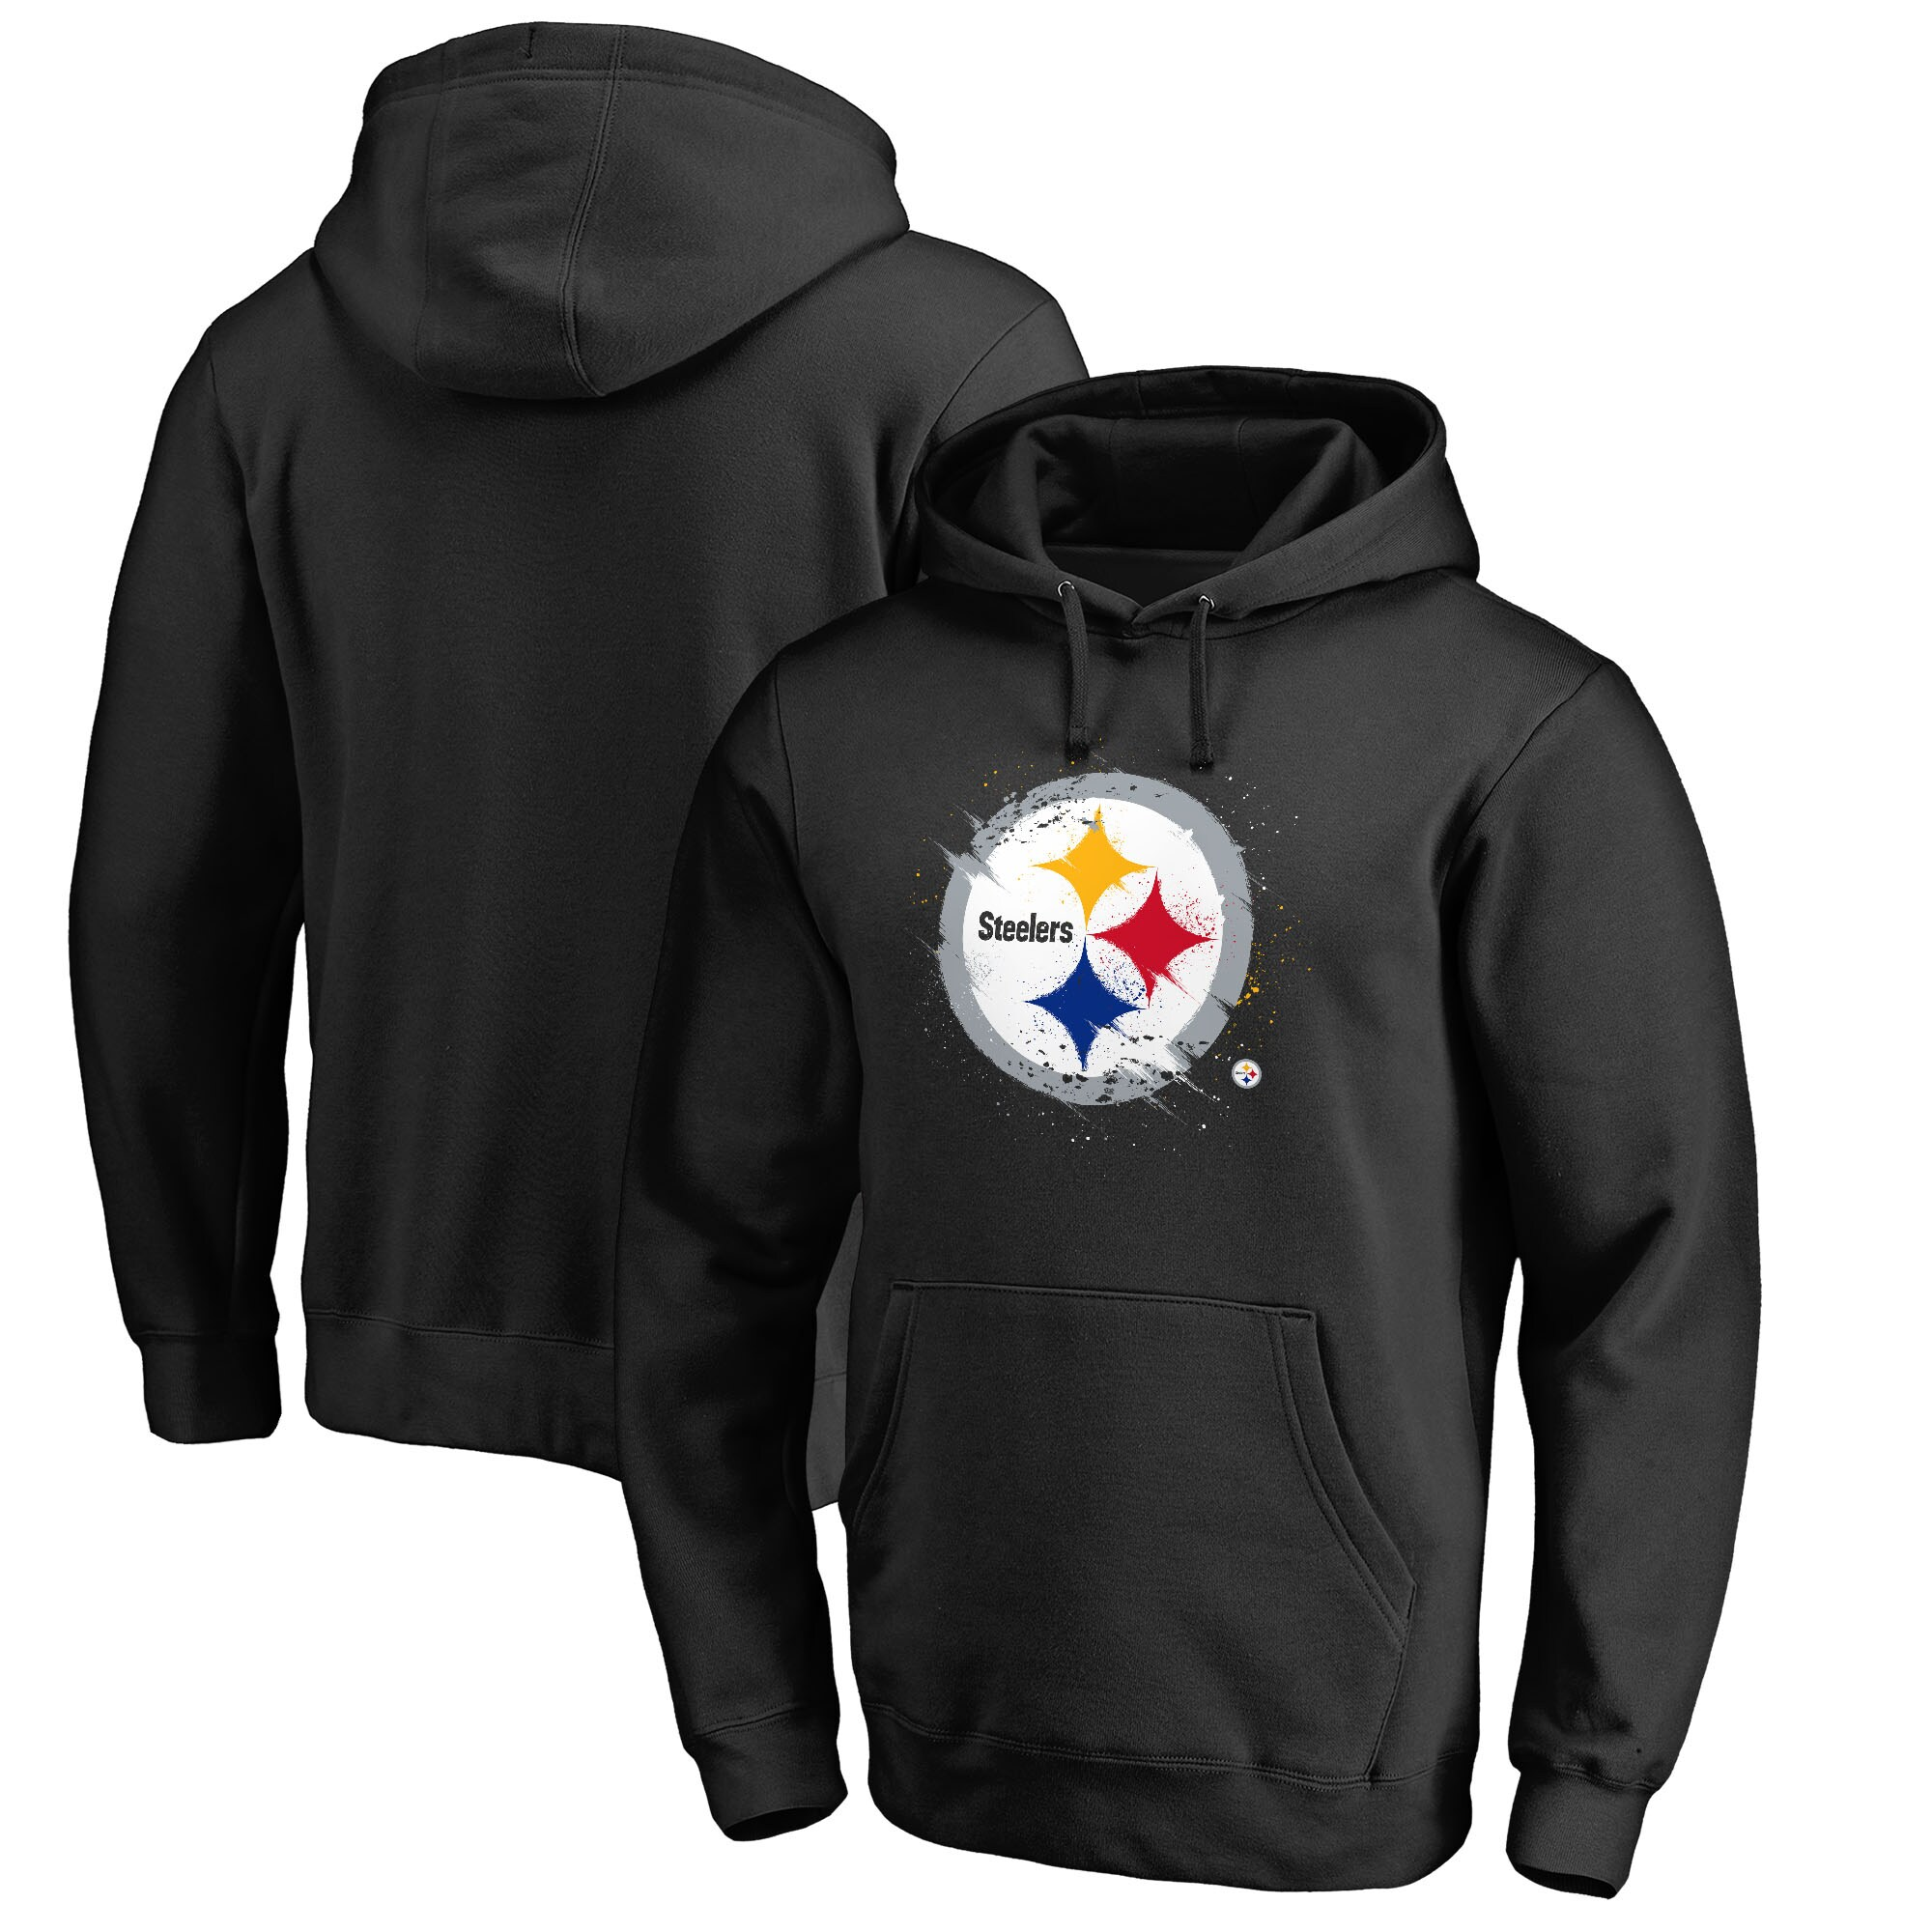 Pittsburgh Steelers NFL Pro Line by Fanatics Branded Splatter Logo Pullover Hoodie - Black